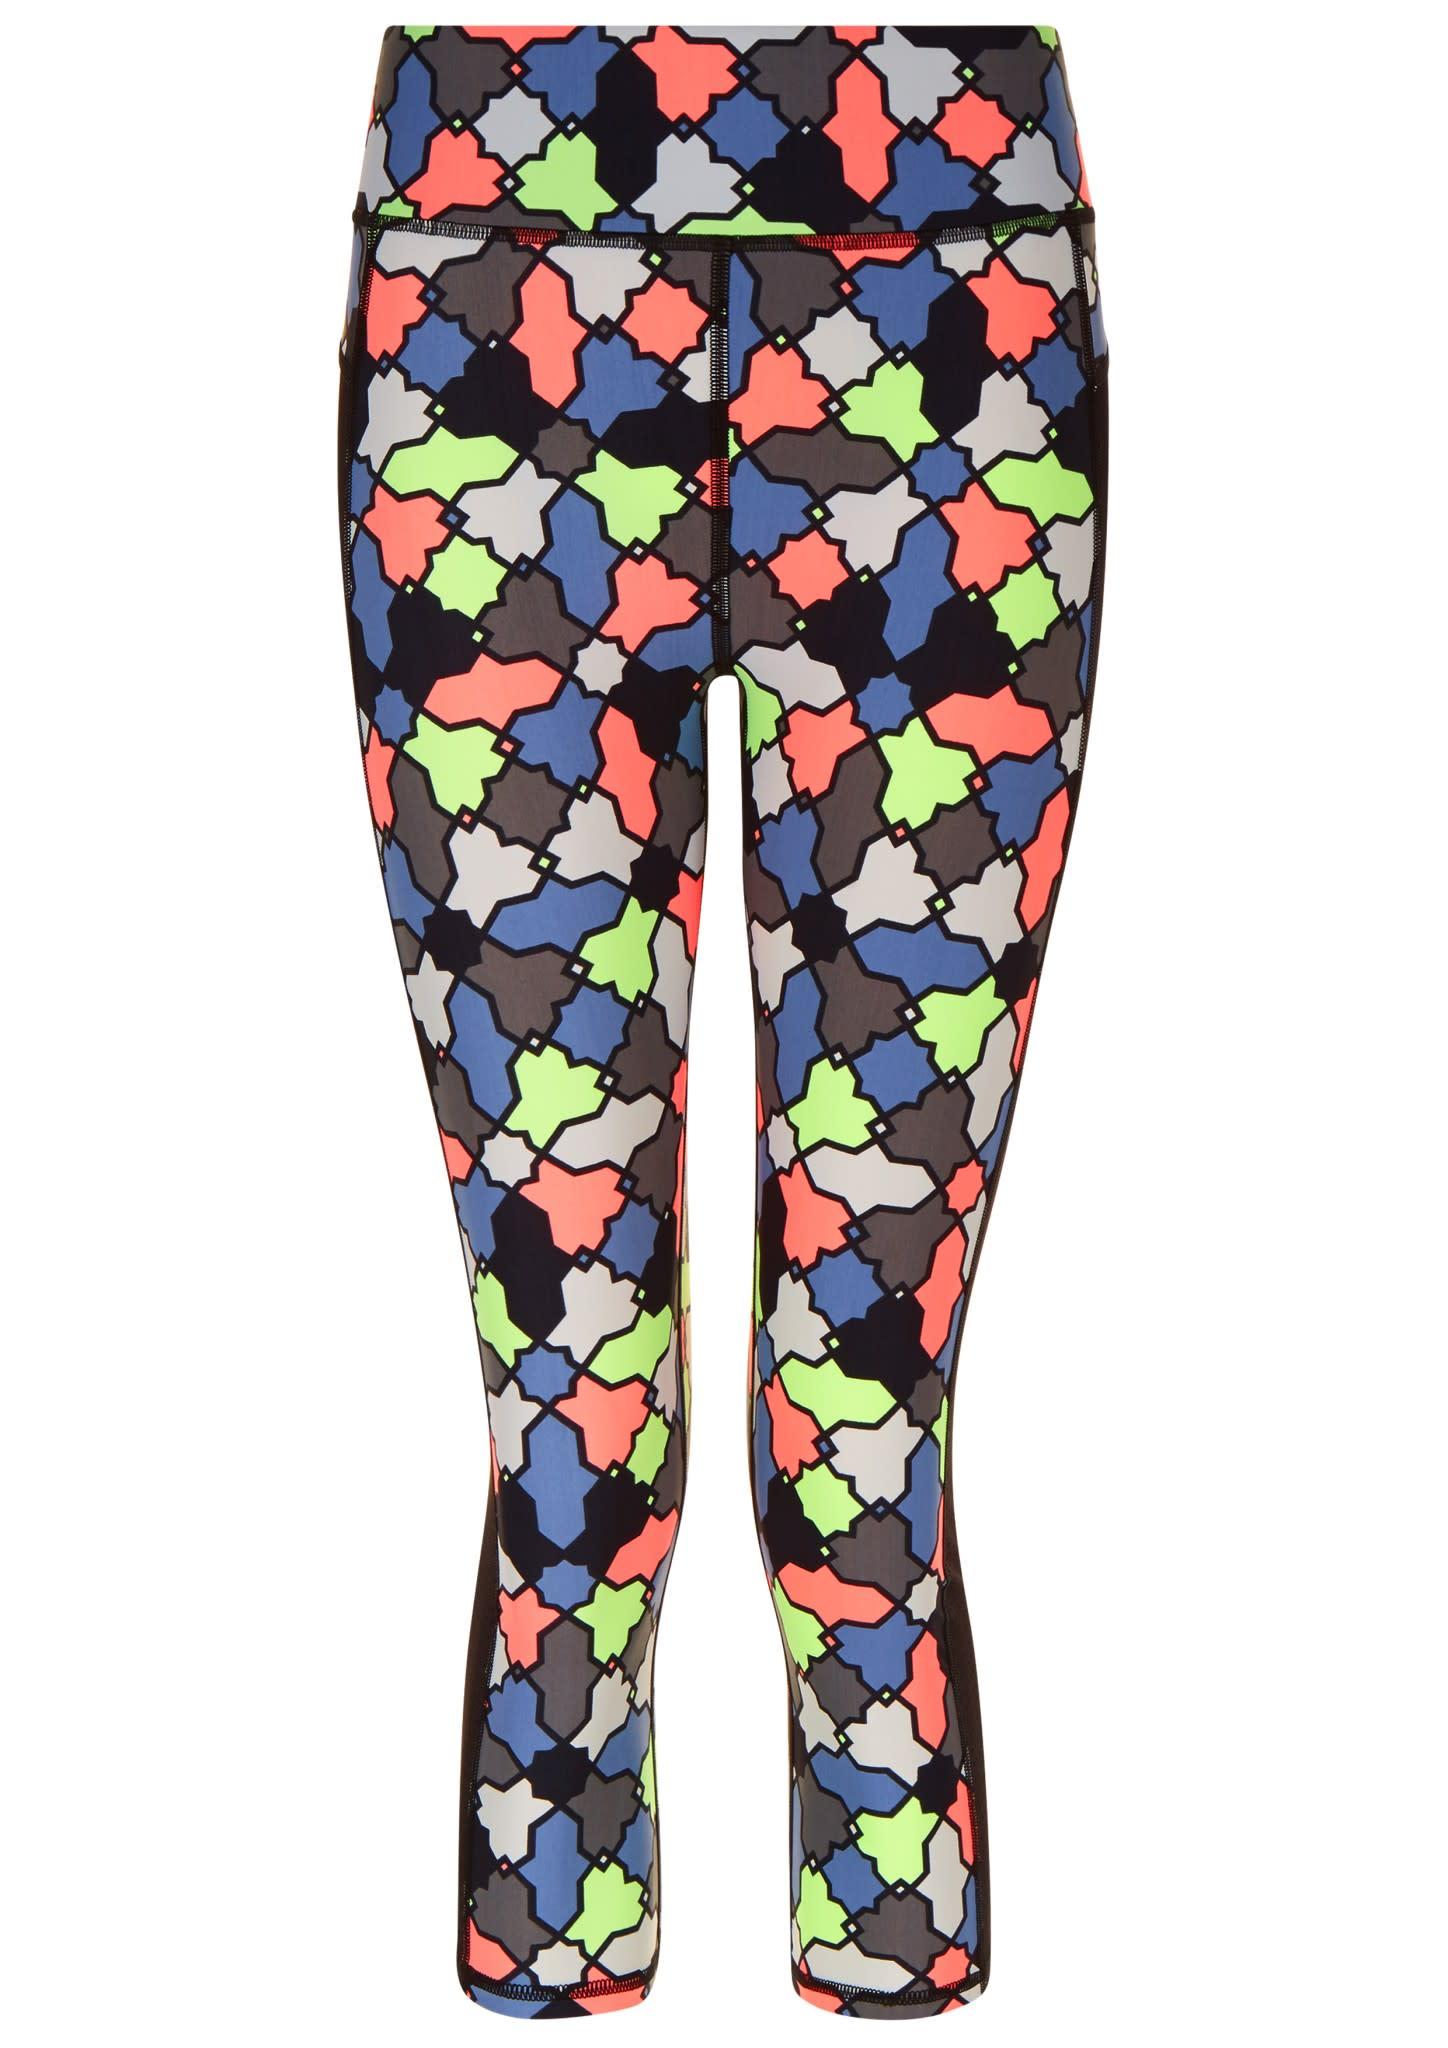 "<p><a href=""http://www.sweatybetty.com/clothes/bottoms/capris/multi-zero-gravity-crop-run-leggings/"" rel=""nofollow noopener"" target=""_blank"" data-ylk=""slk:Sweaty Betty, £80"" class=""link rapid-noclick-resp"">Sweaty Betty, £80</a> </p>"